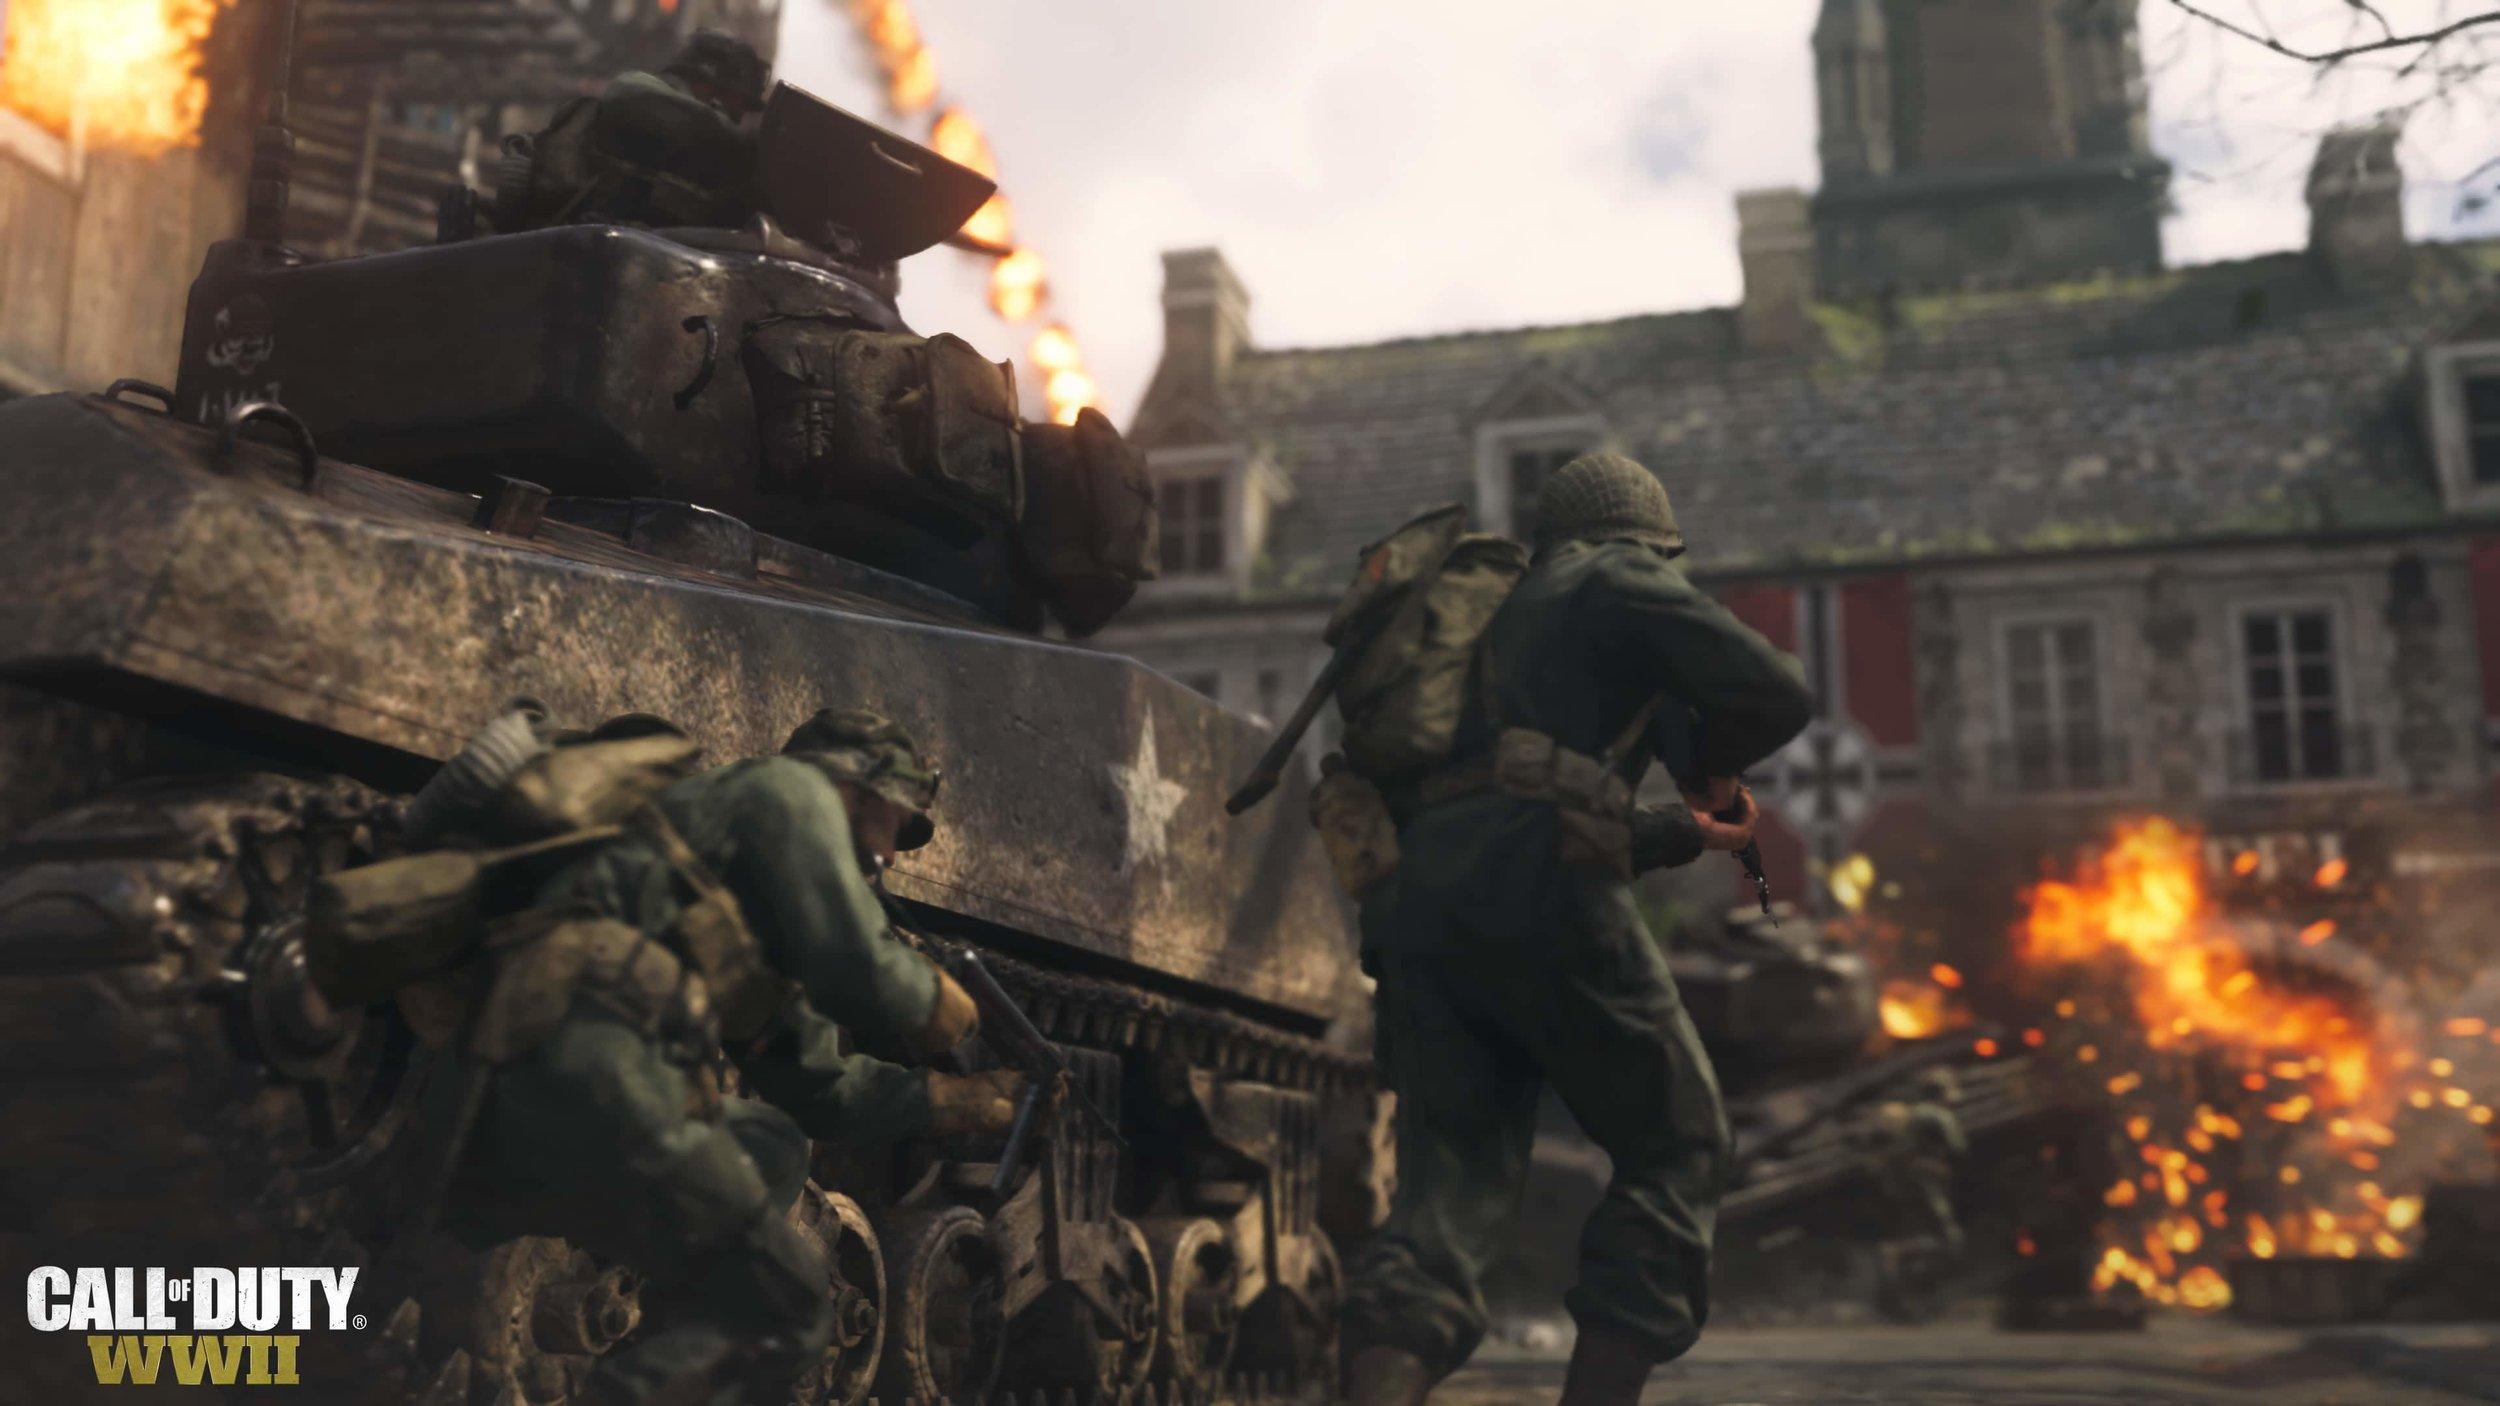 call-of-duty-beta-screenshot